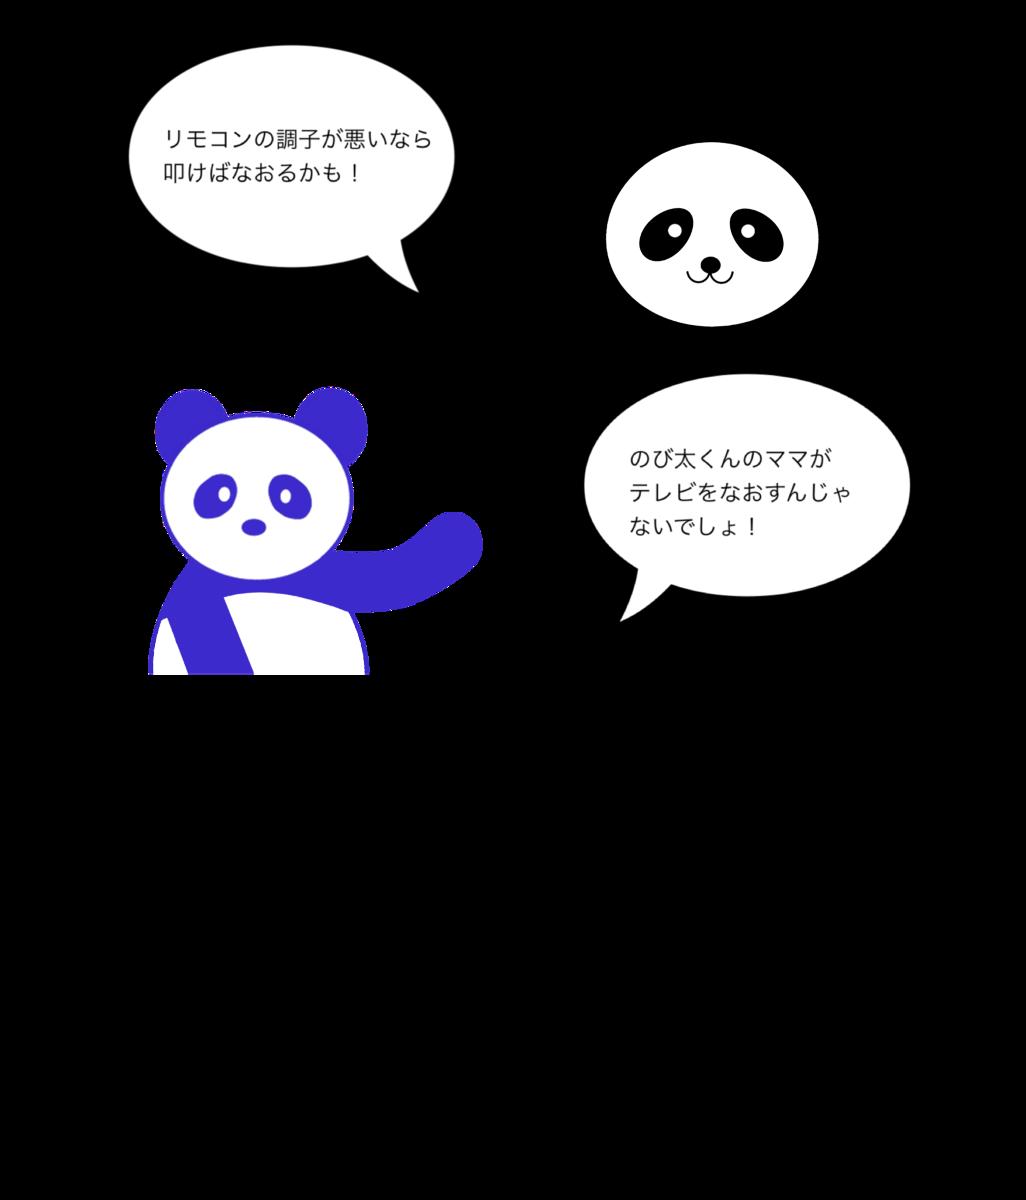 f:id:dora-neko:20210908191321p:plain